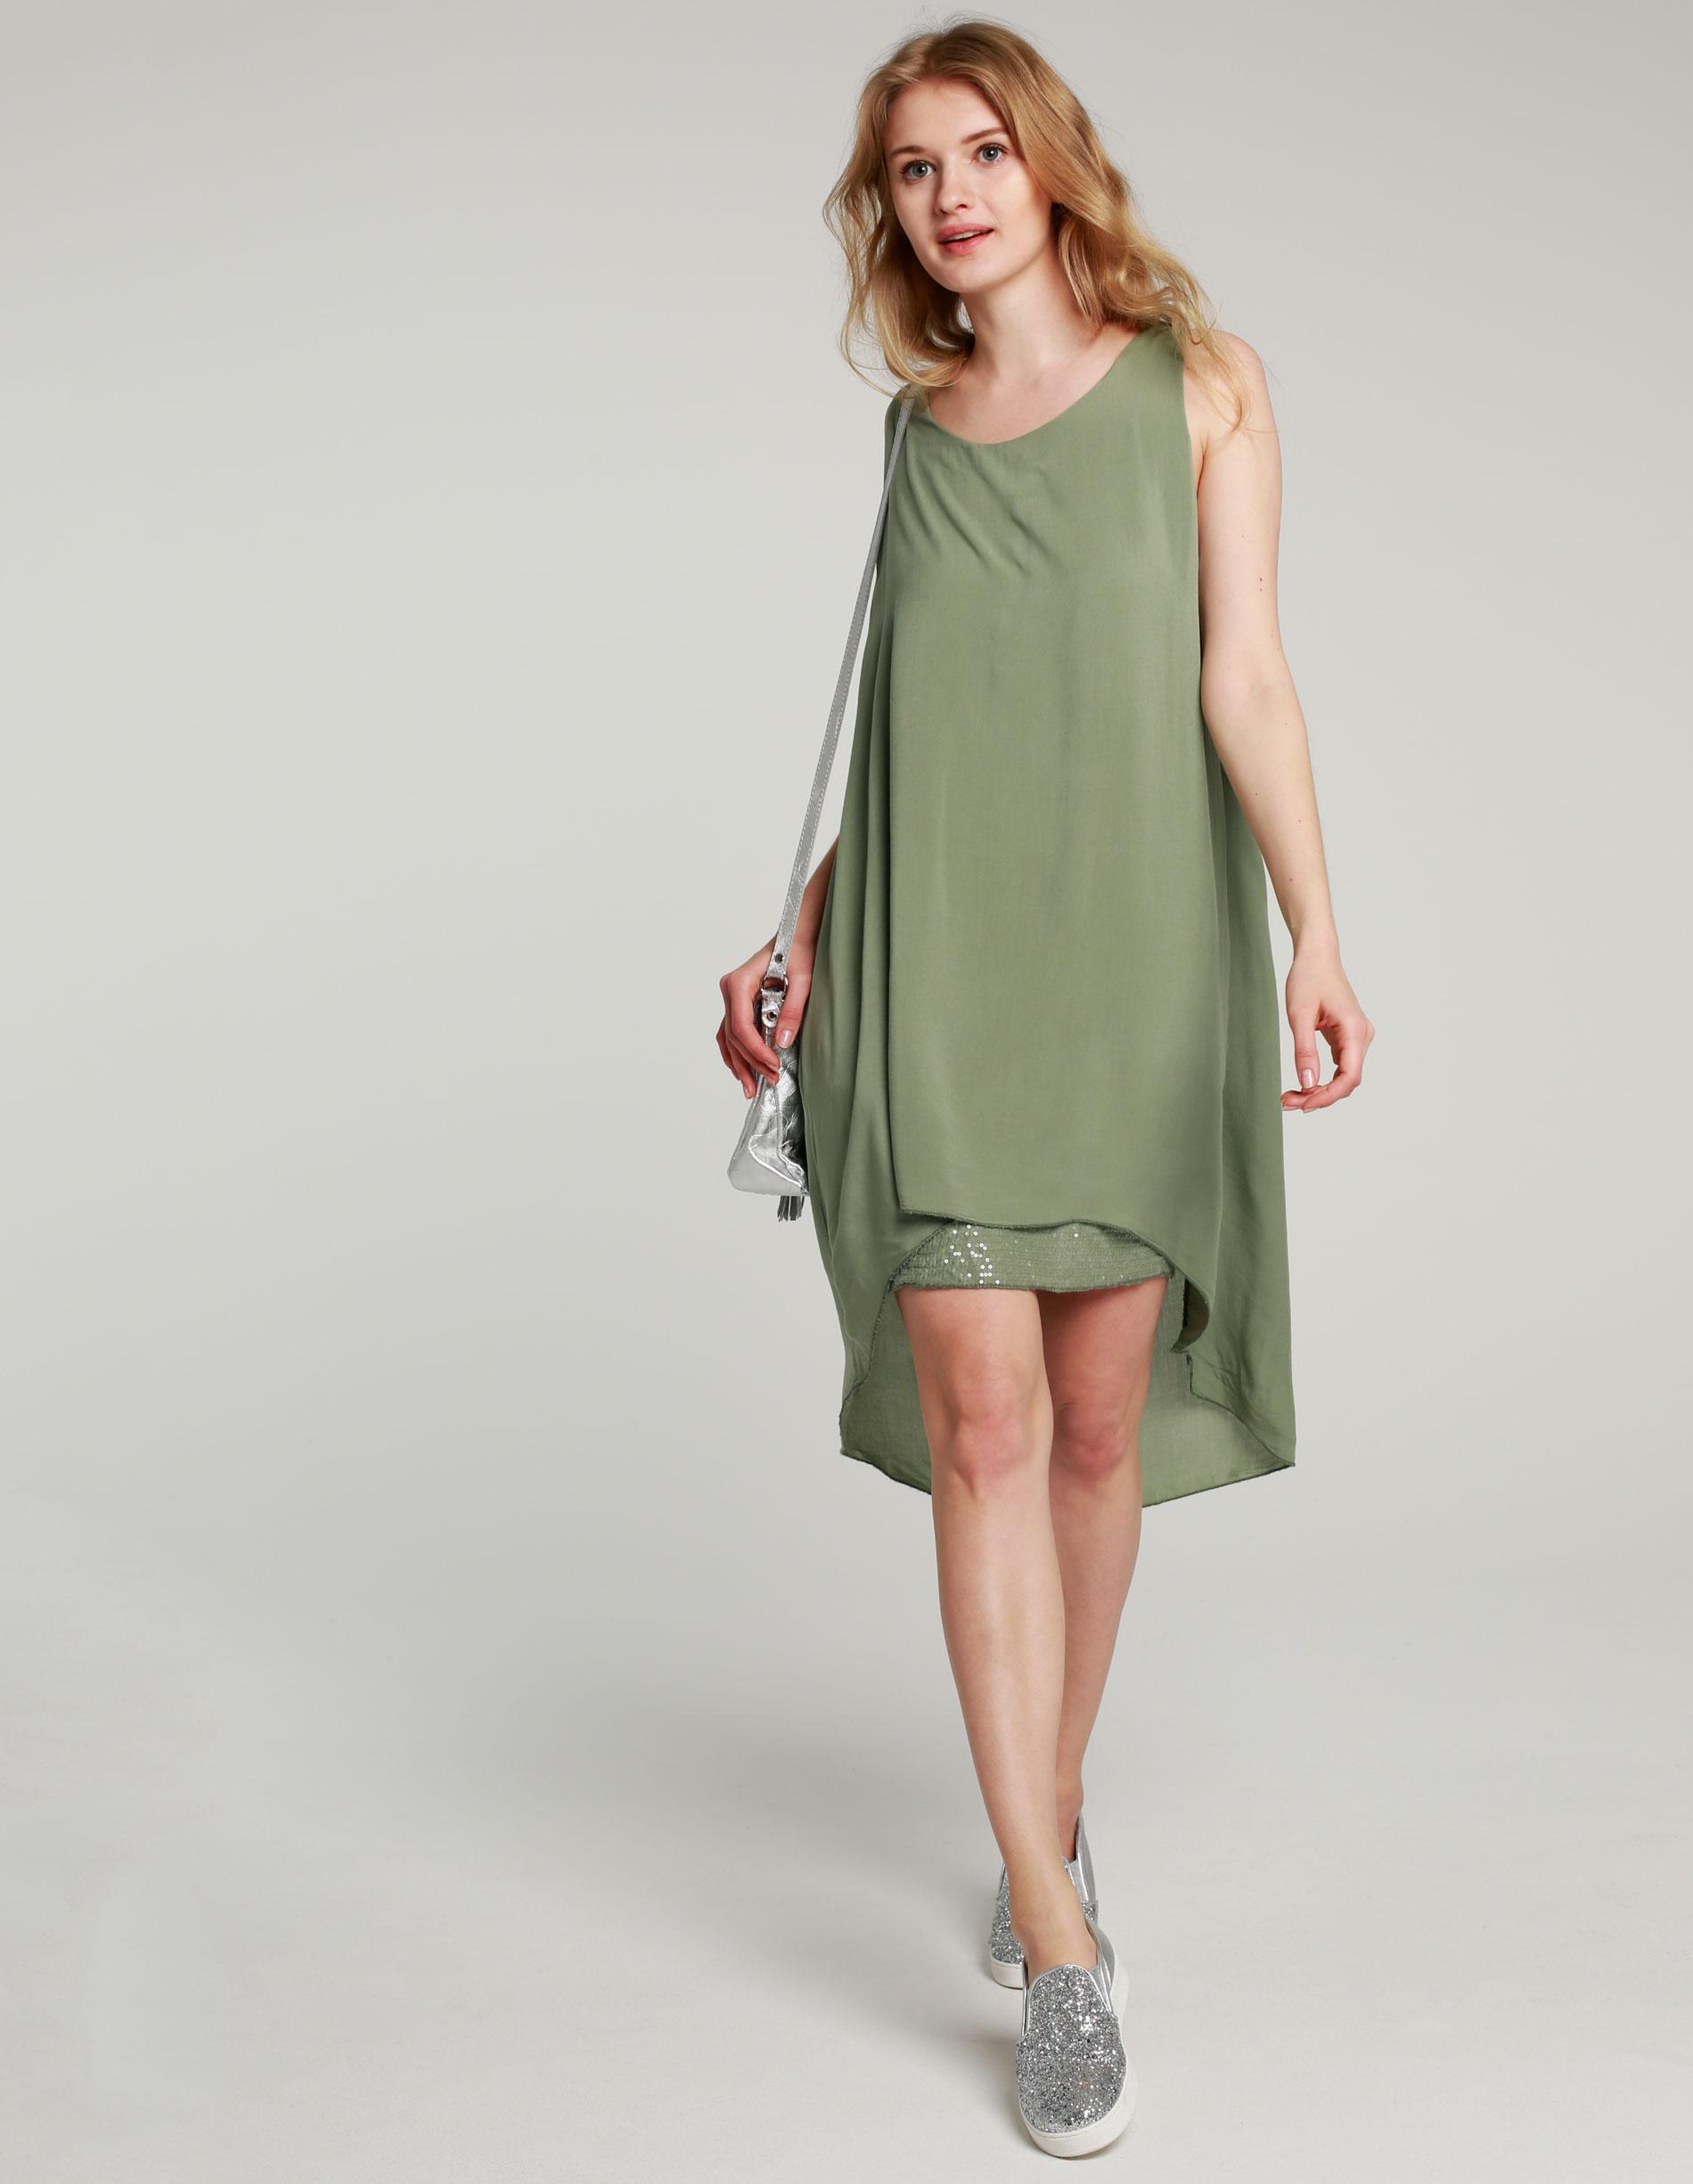 Sukienka - 65-5038L MILI - Unisono